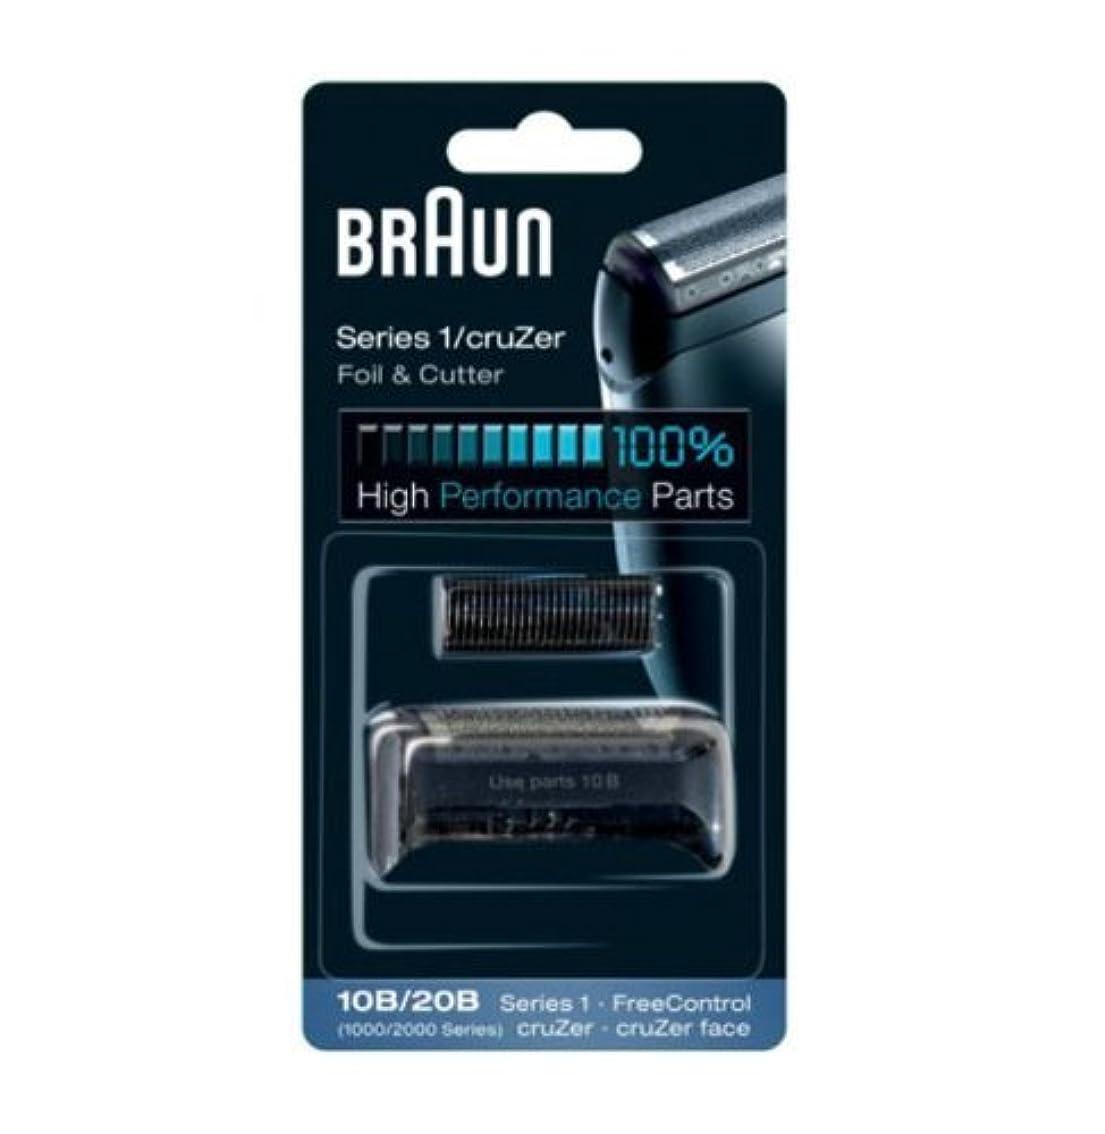 繁殖商品りBraun Replacement Foil & Cutter - 10B, Series 1,FreeControl - 1000 Series by Braun [並行輸入品]